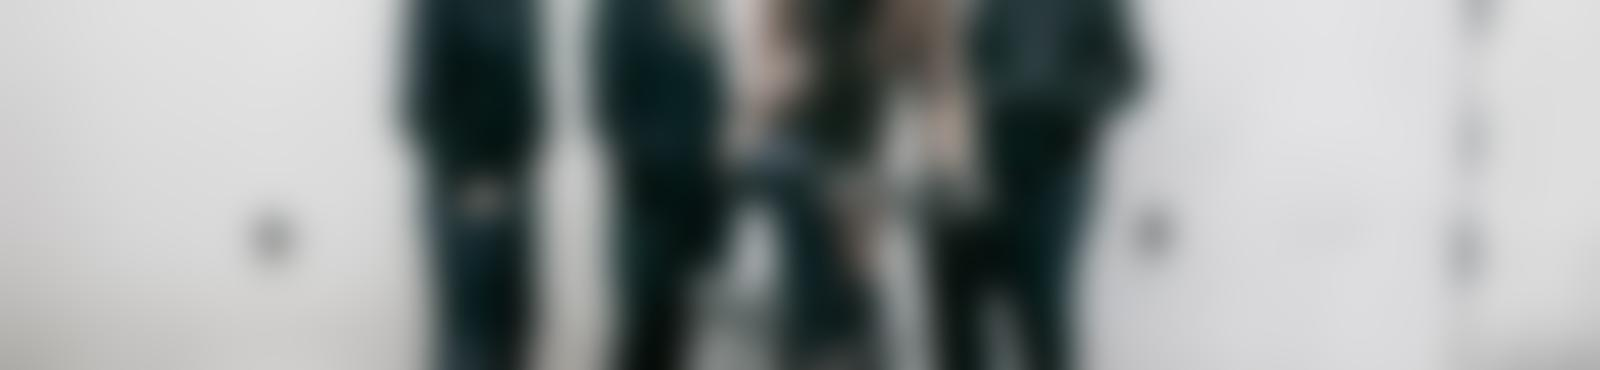 Blurred 98b665ad d696 44d7 ac86 cb11c4e88cab